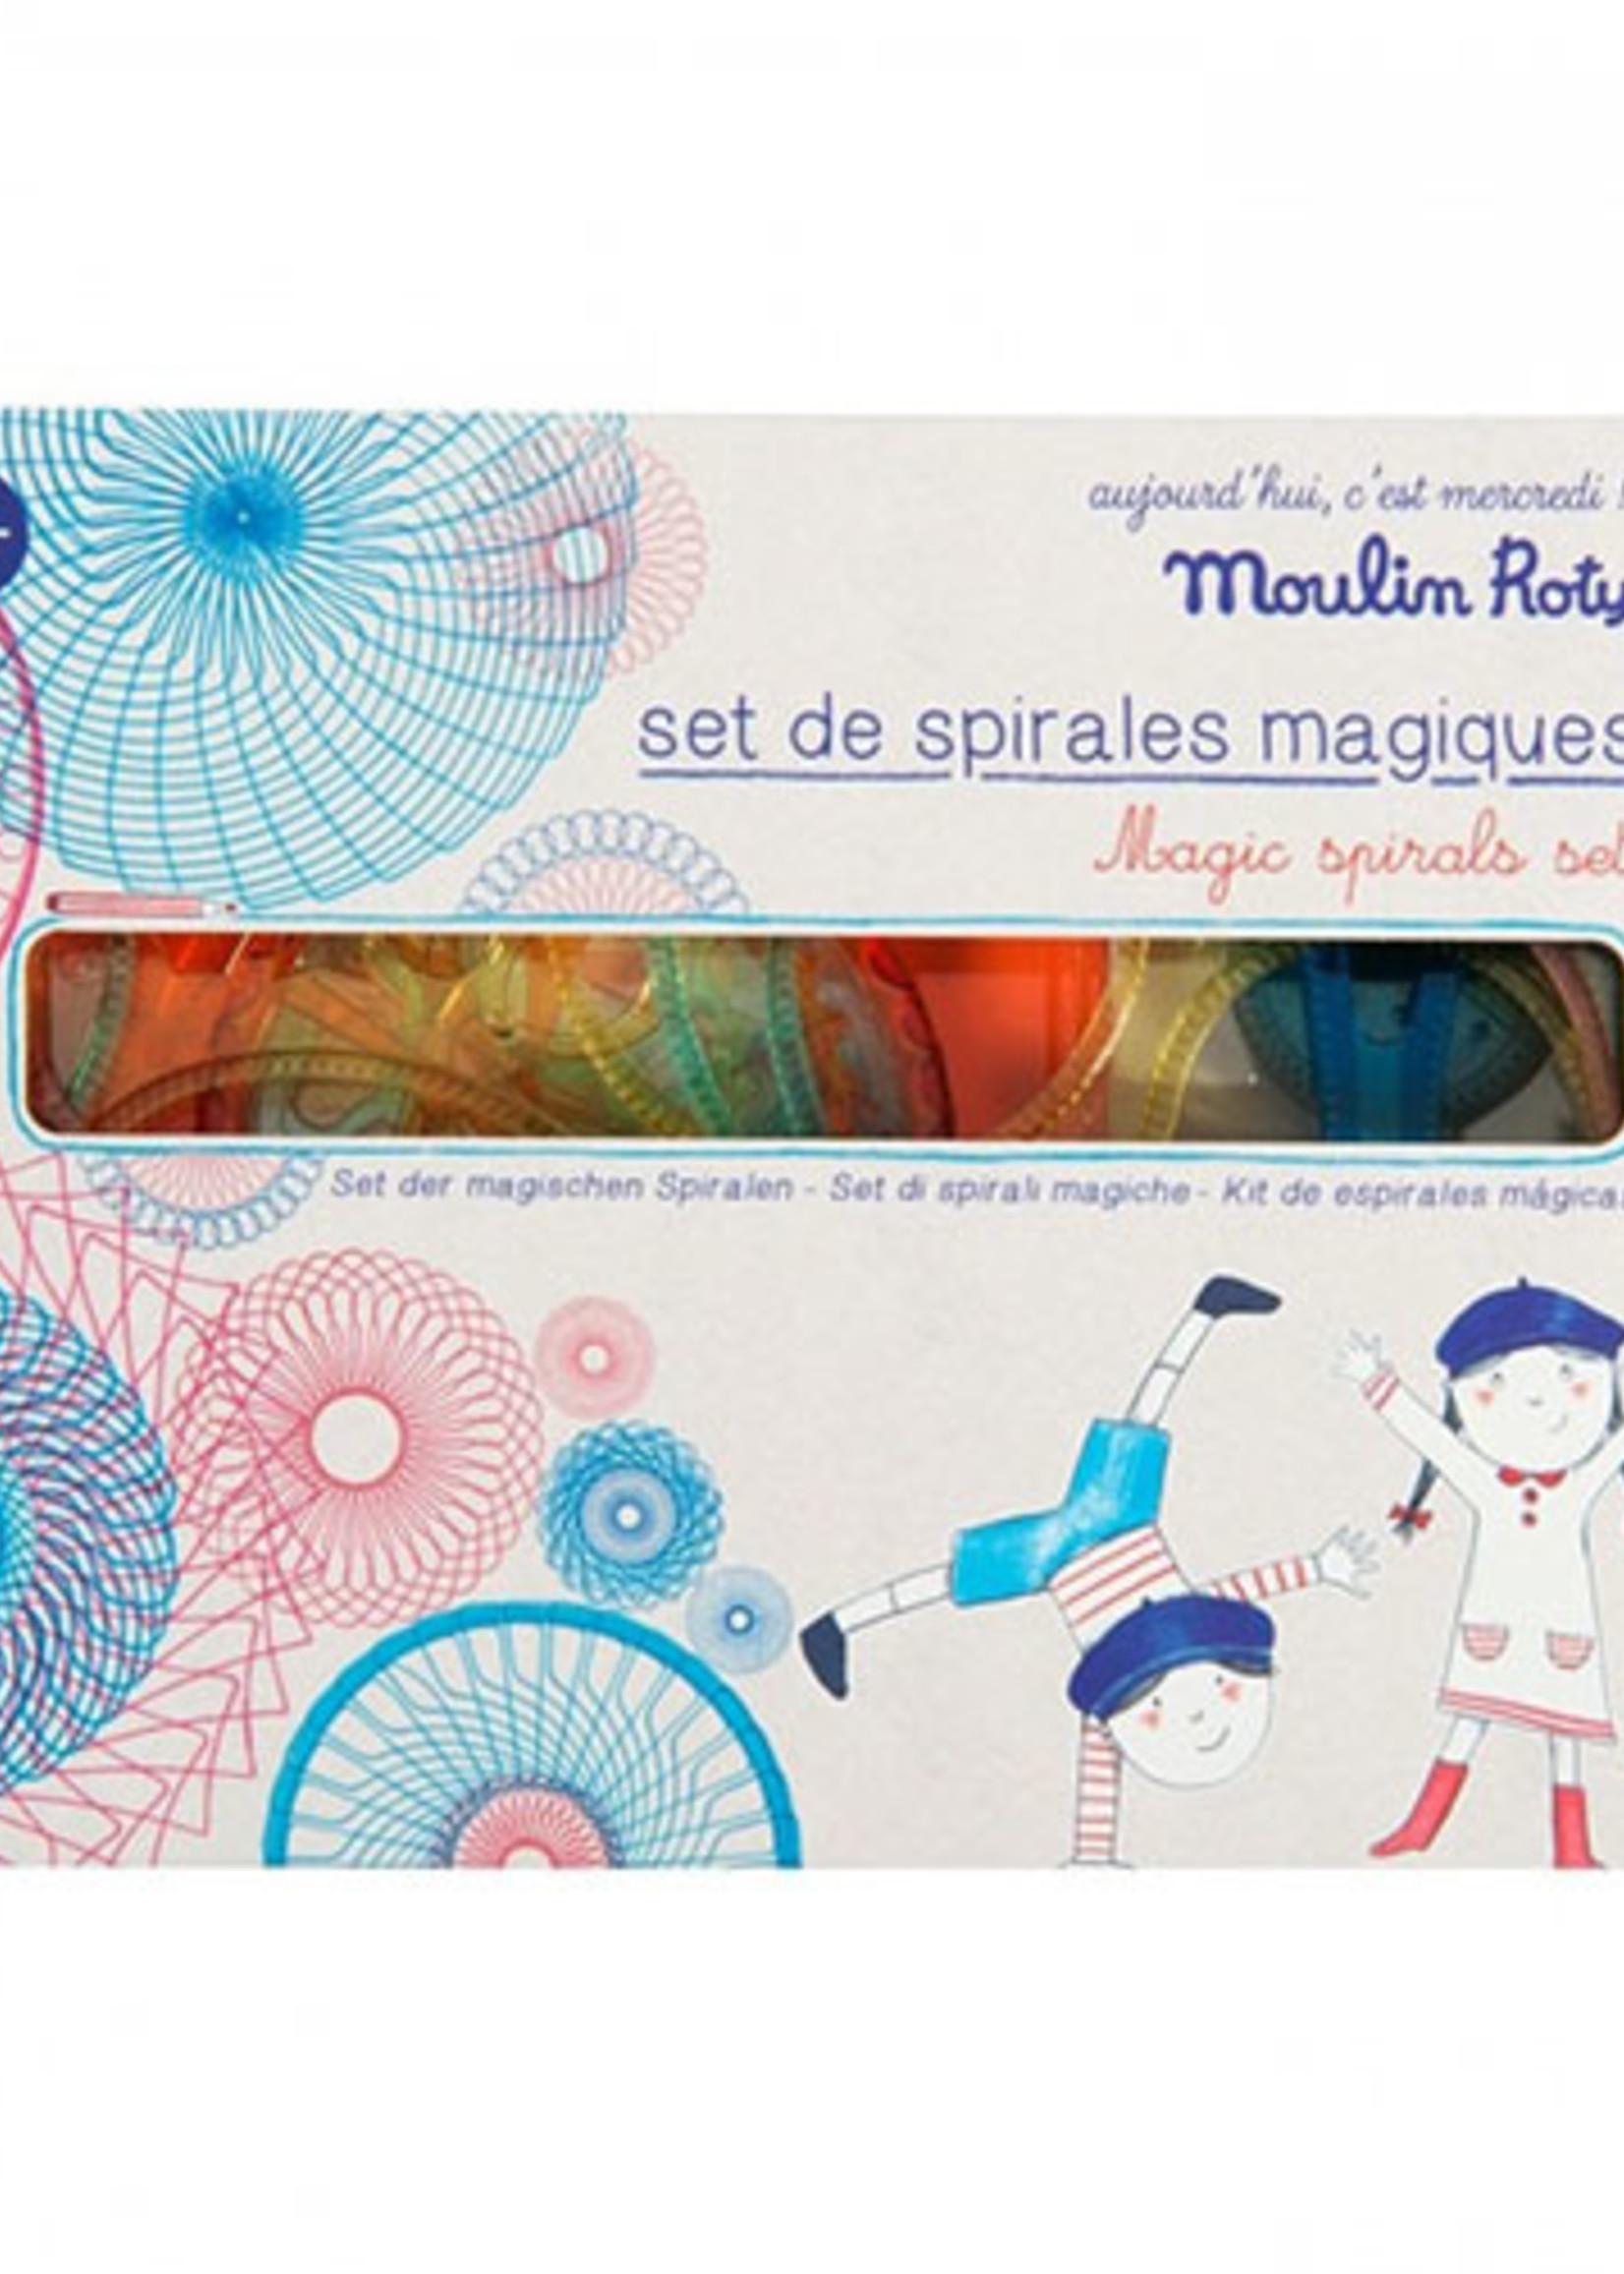 Moulin Roty Mideer-ss21 Aujourd hui cest mercredi - magic spirals set   Code: 713153